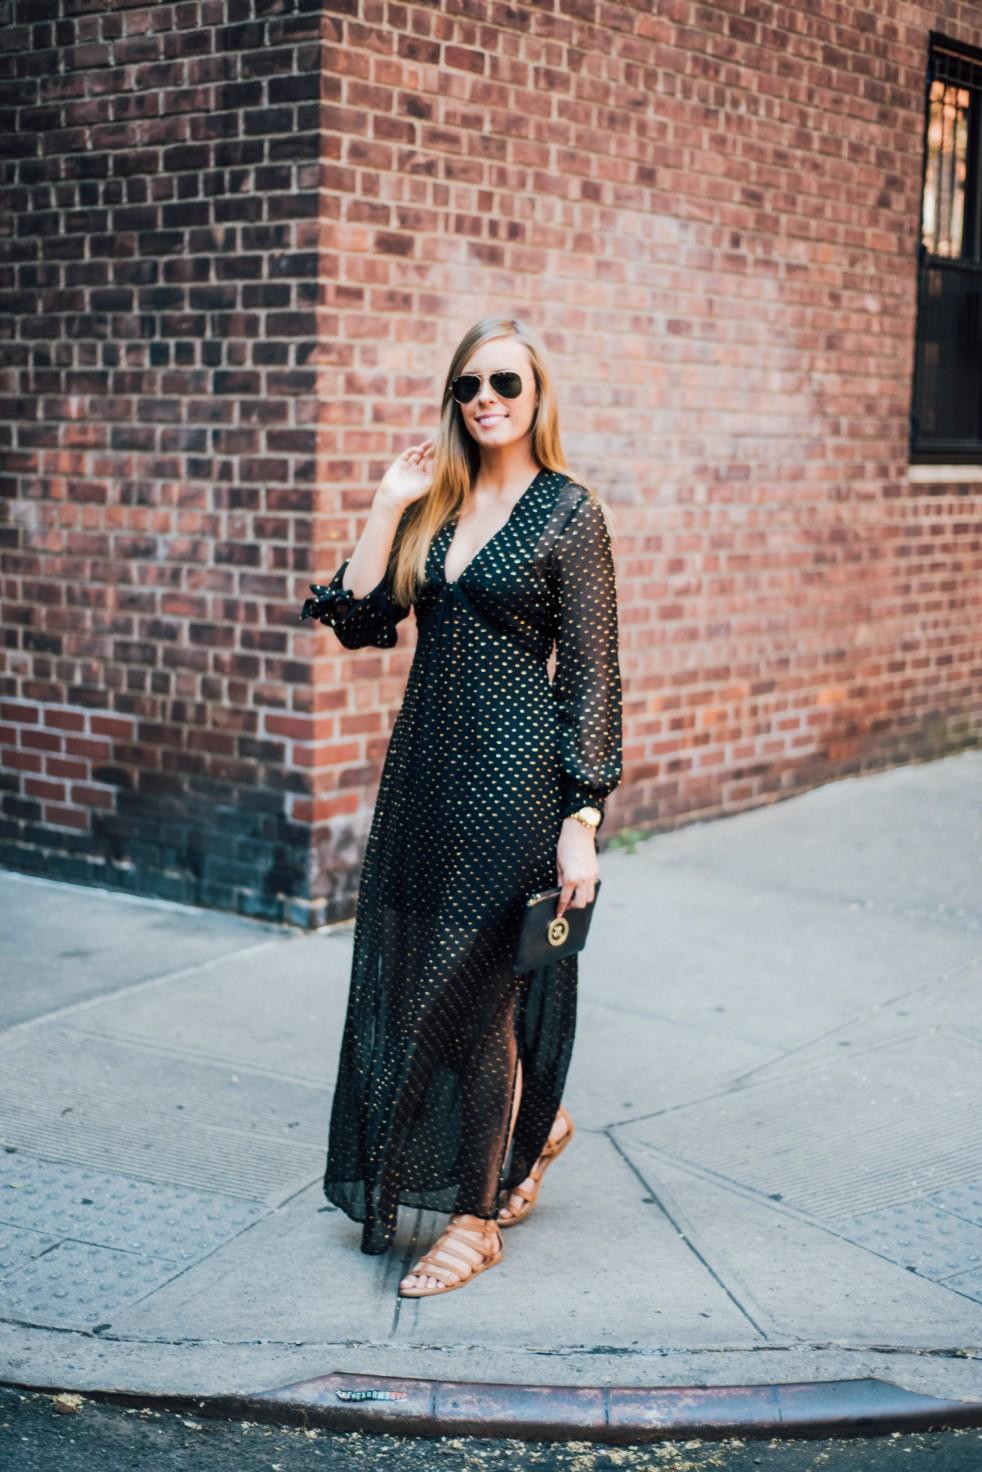 black gold metallic dot maxi dress H&M new york fashion blogger west village lauren slade style elixir blog | Metallic Gold Polka Dot Dress featured by popular US style blogger, Style Elixir